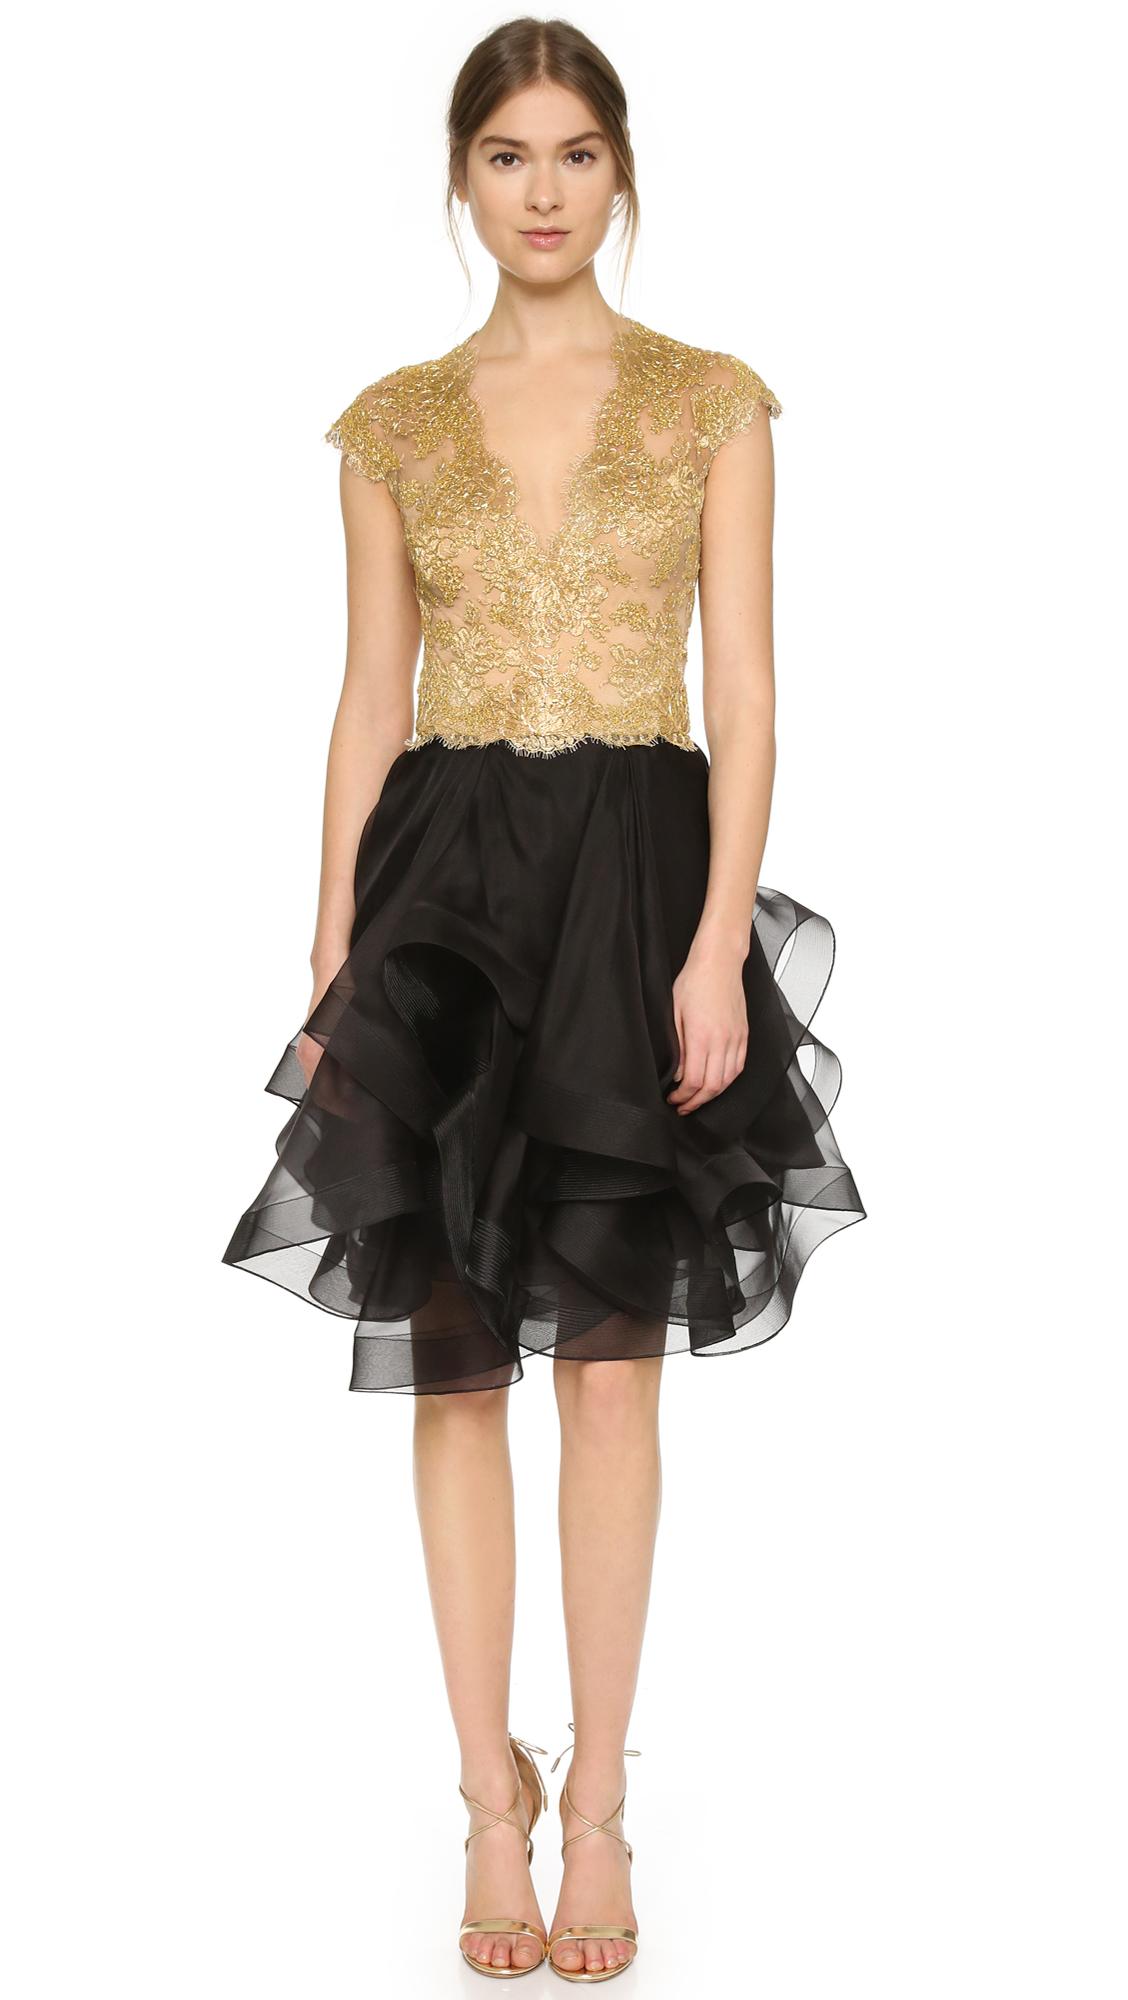 Lyst - Reem Acra Cap Sleeve Lace Dress in Metallic